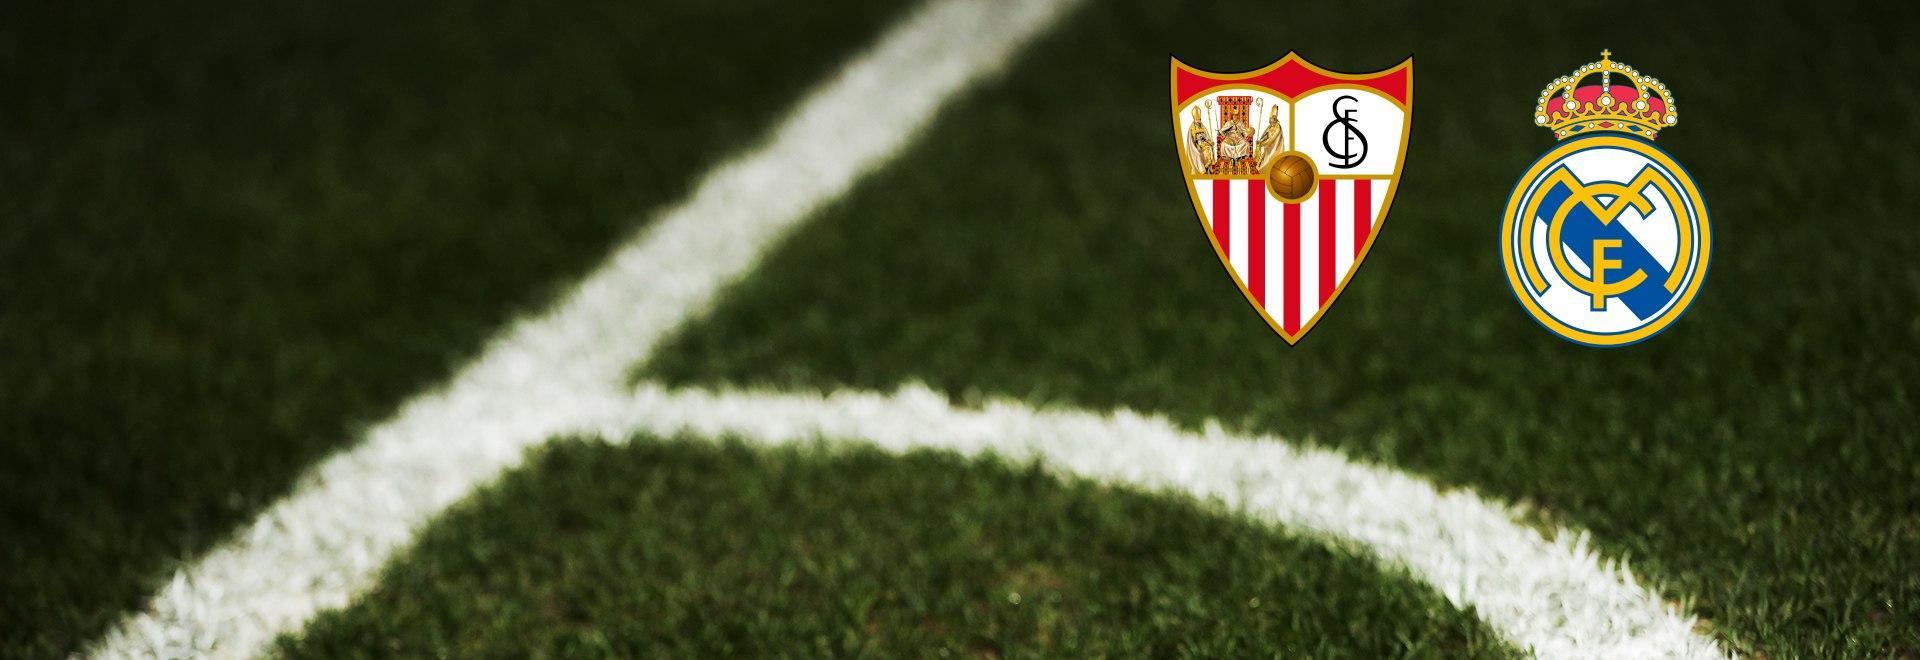 Siviglia - Real Madrid. 12a g.